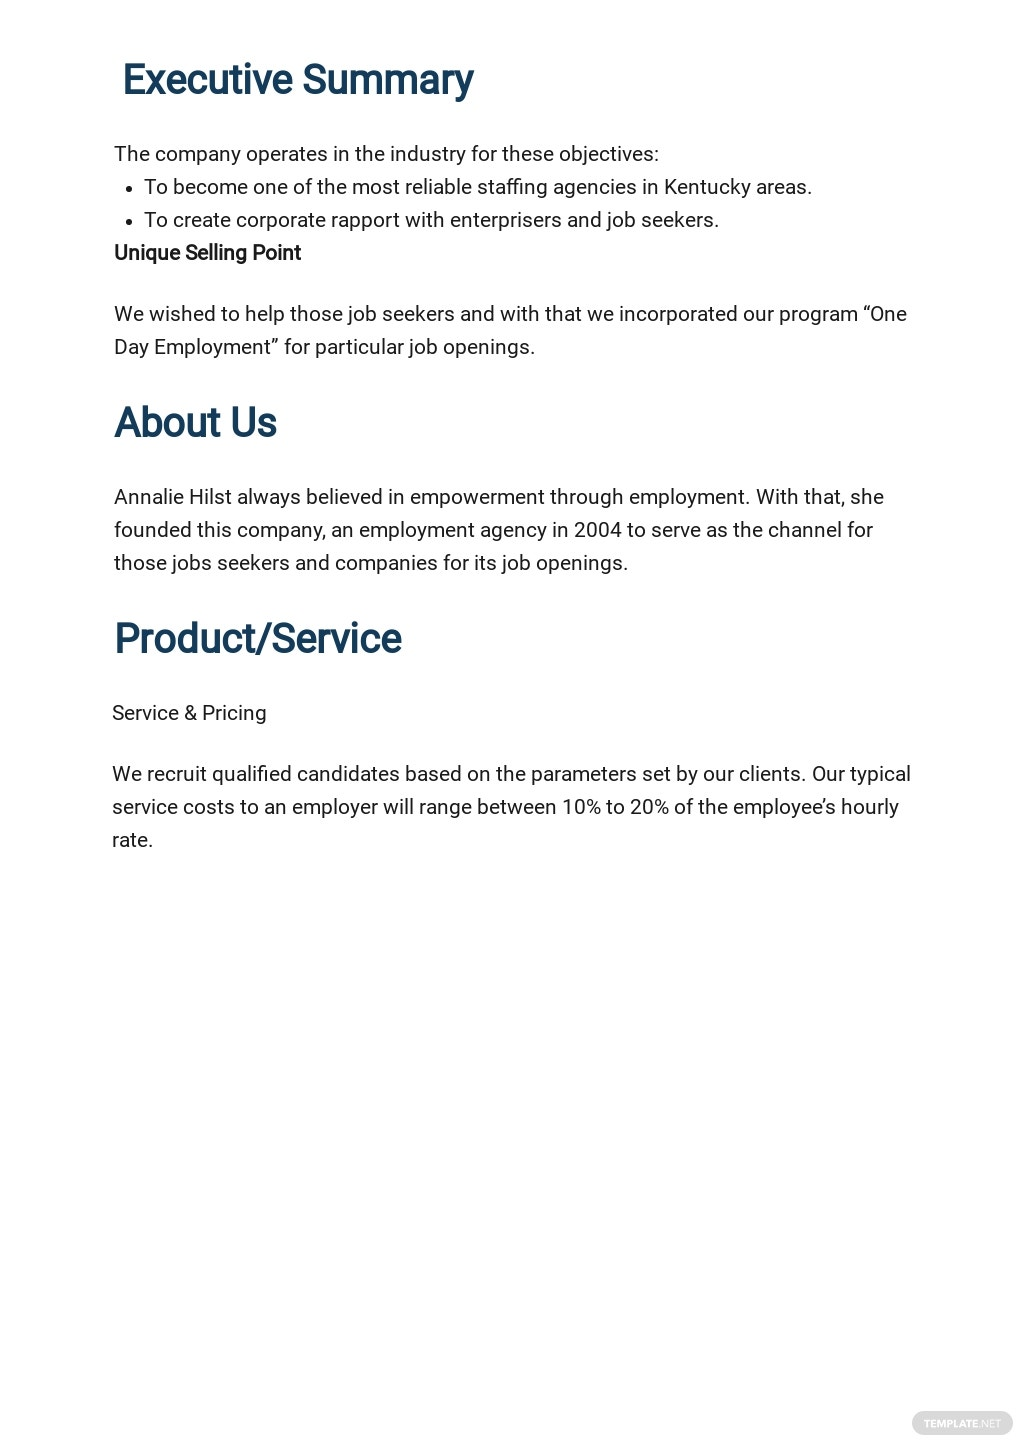 Employment Agency Business Plan Template 1.jpe